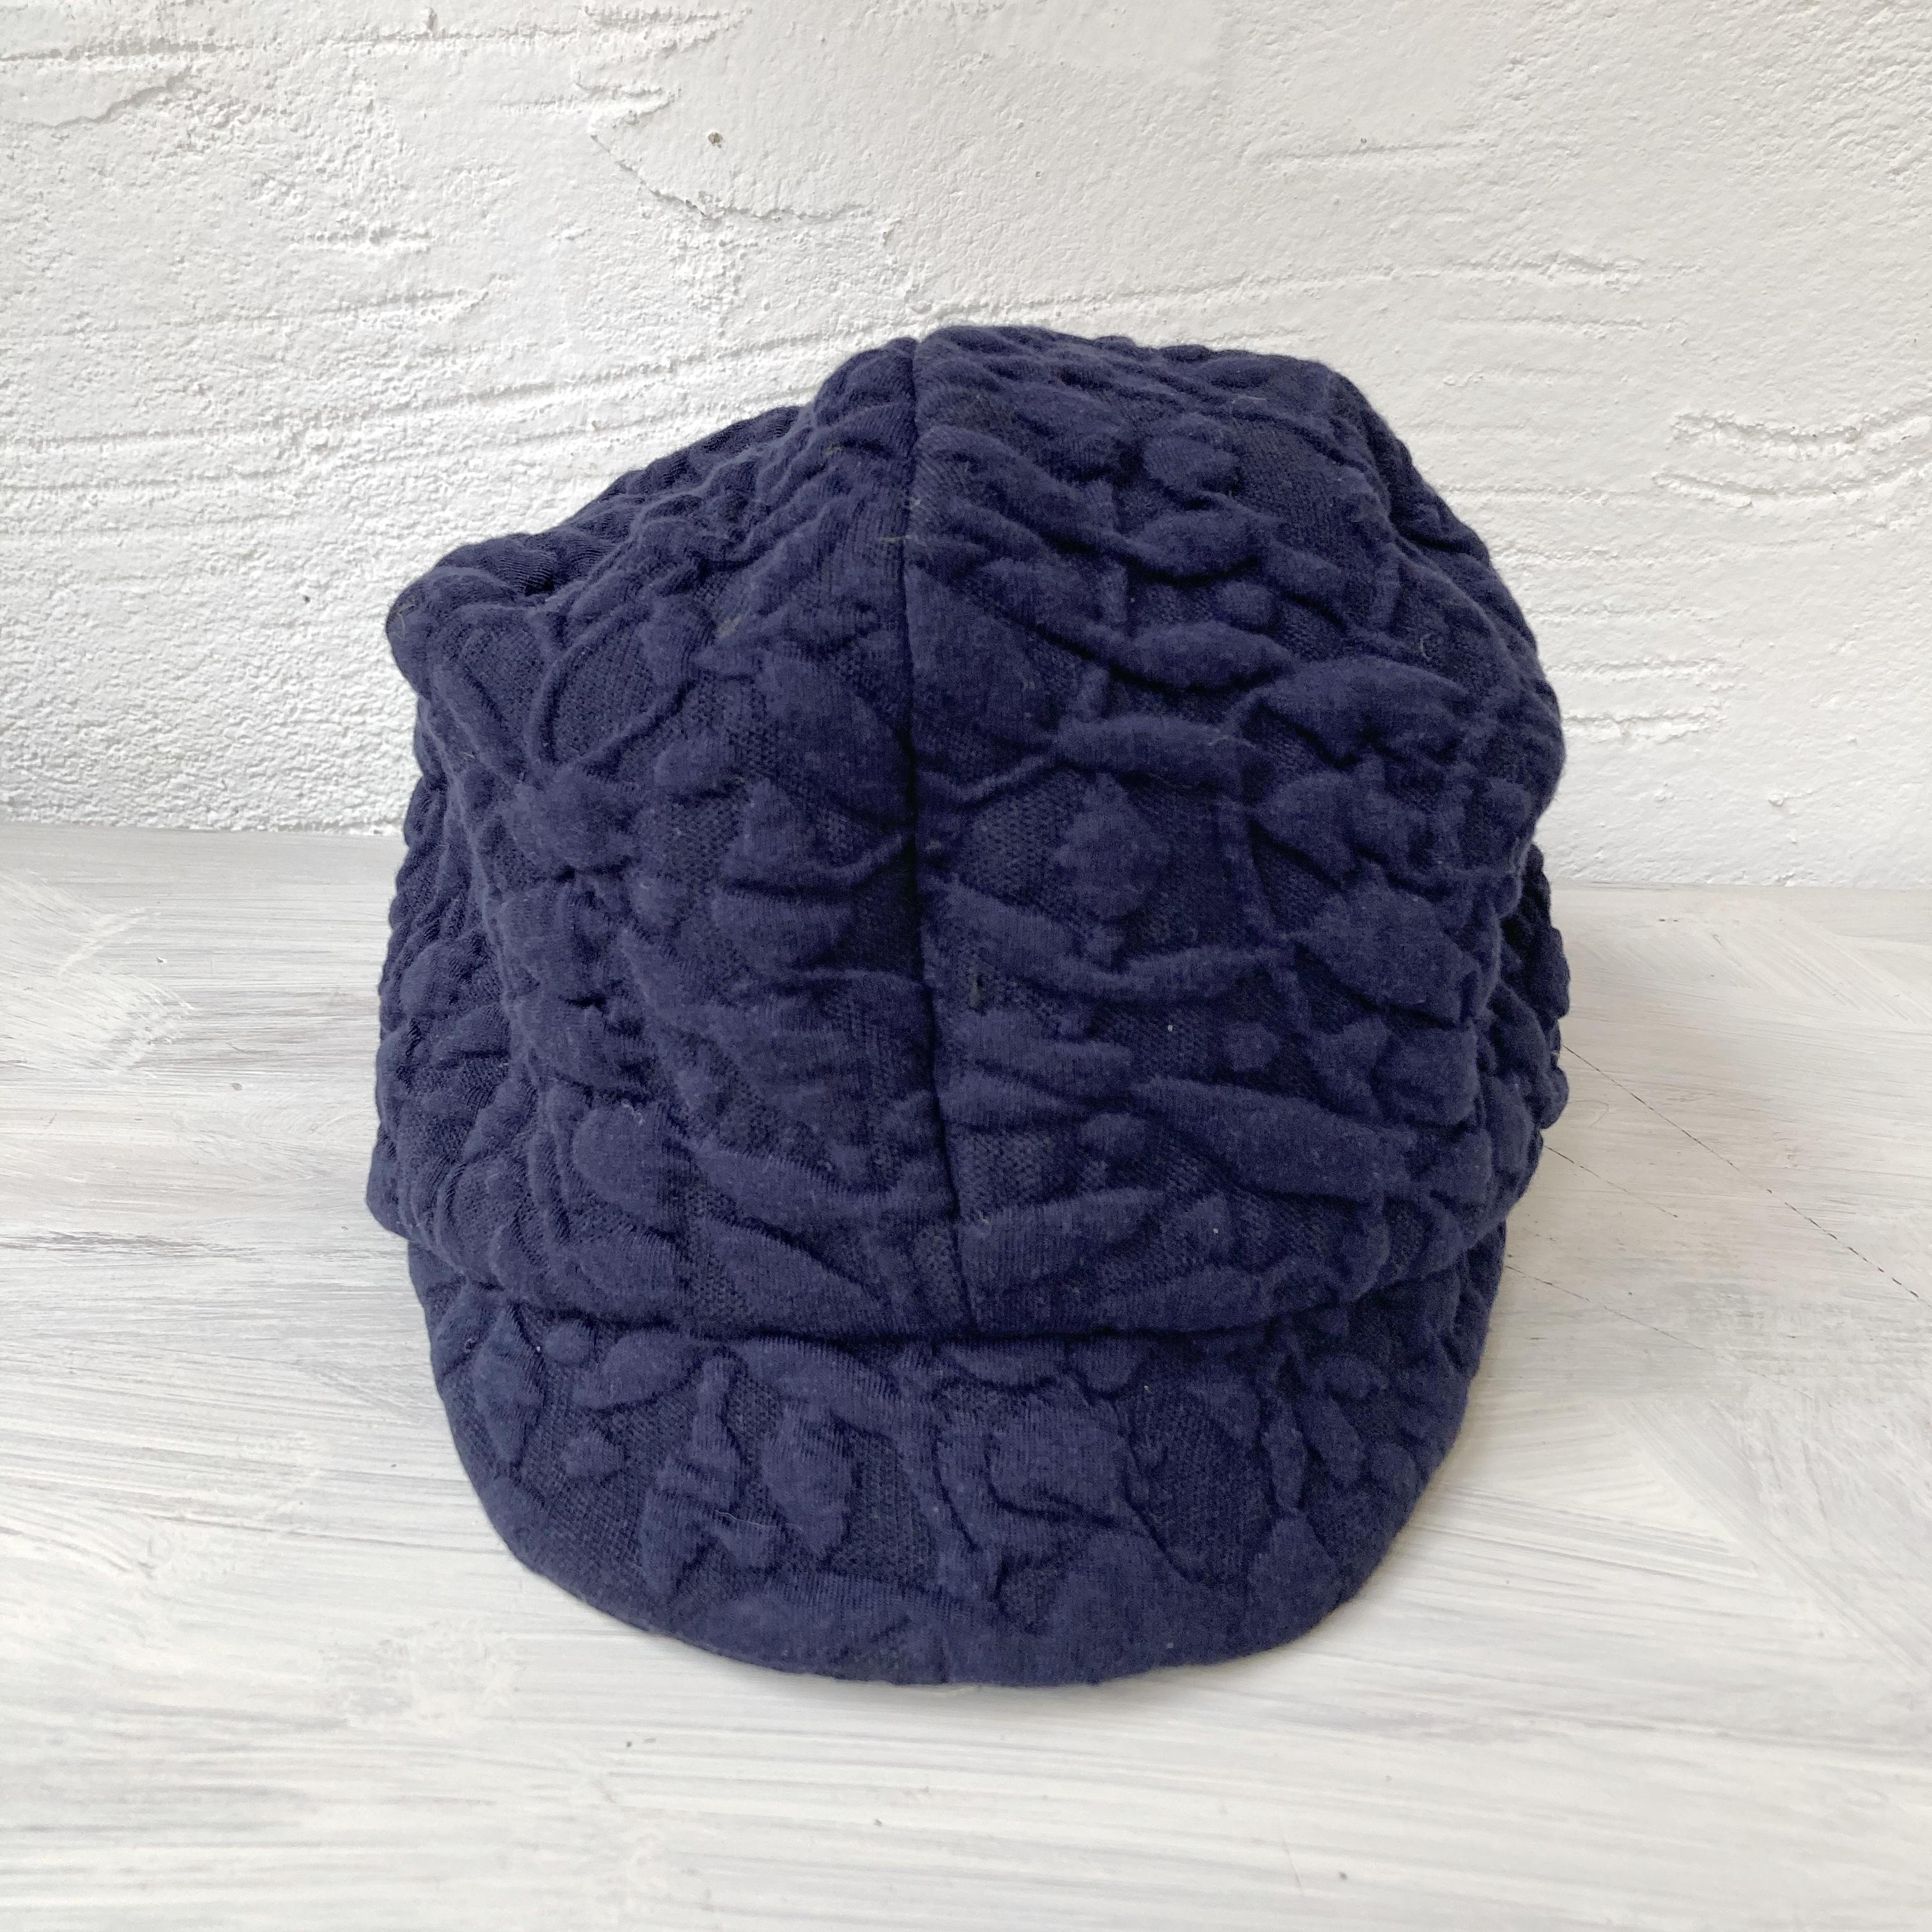 【LuLu de Chapeau】凹凸ニットJQキャスケット帽(ネイビー)